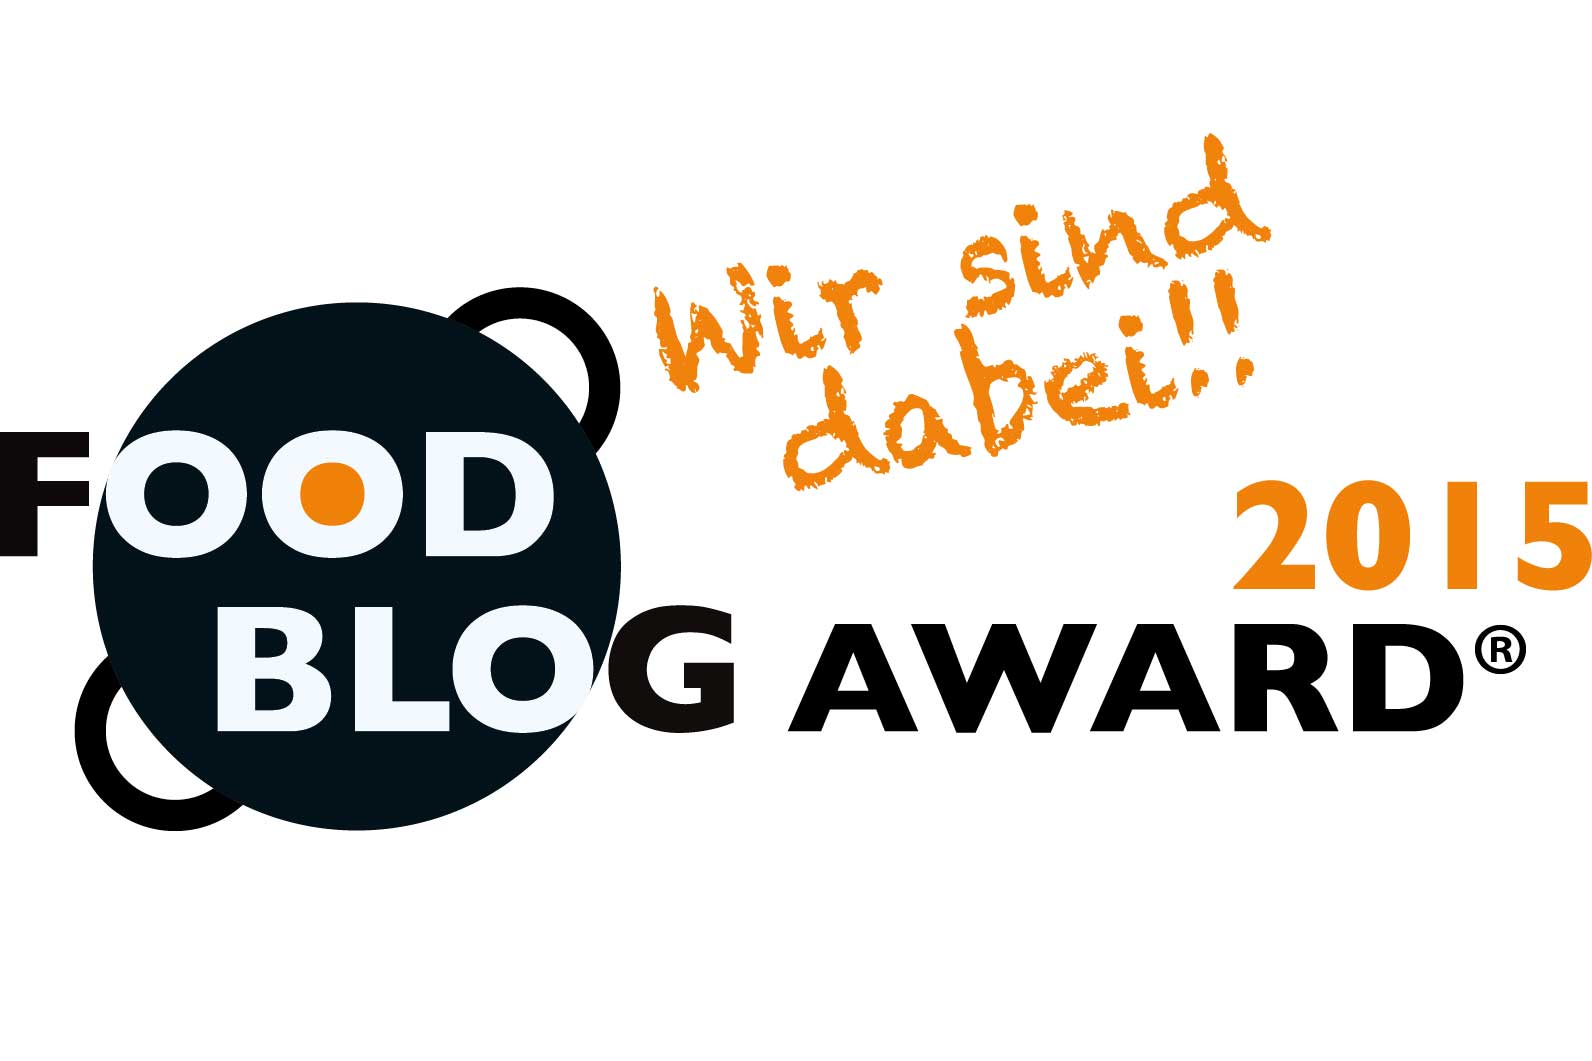 food blogger award 2015